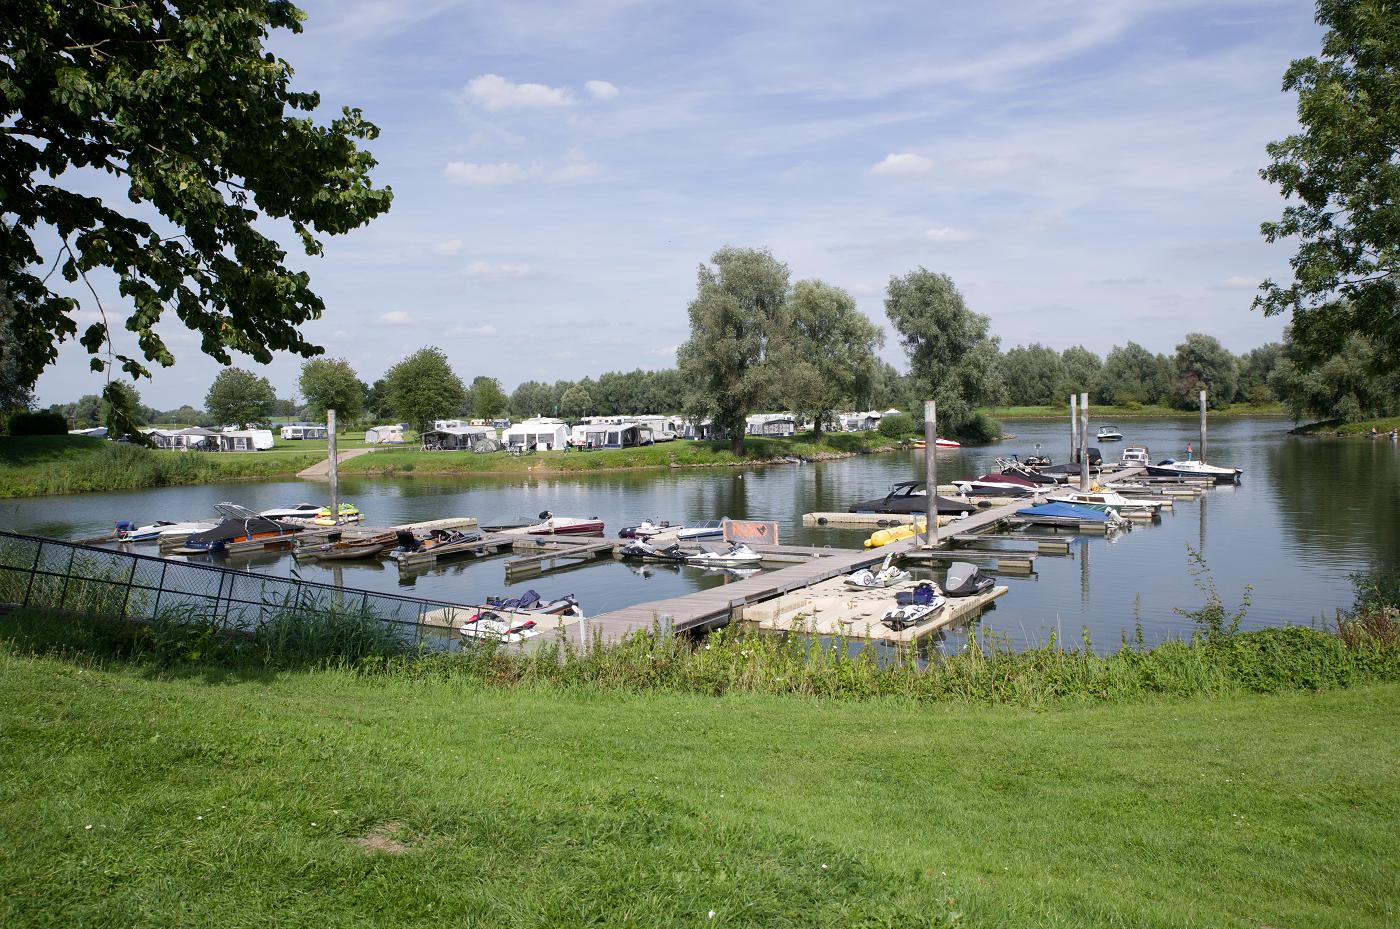 Camping Gelderland kindvriendelijk